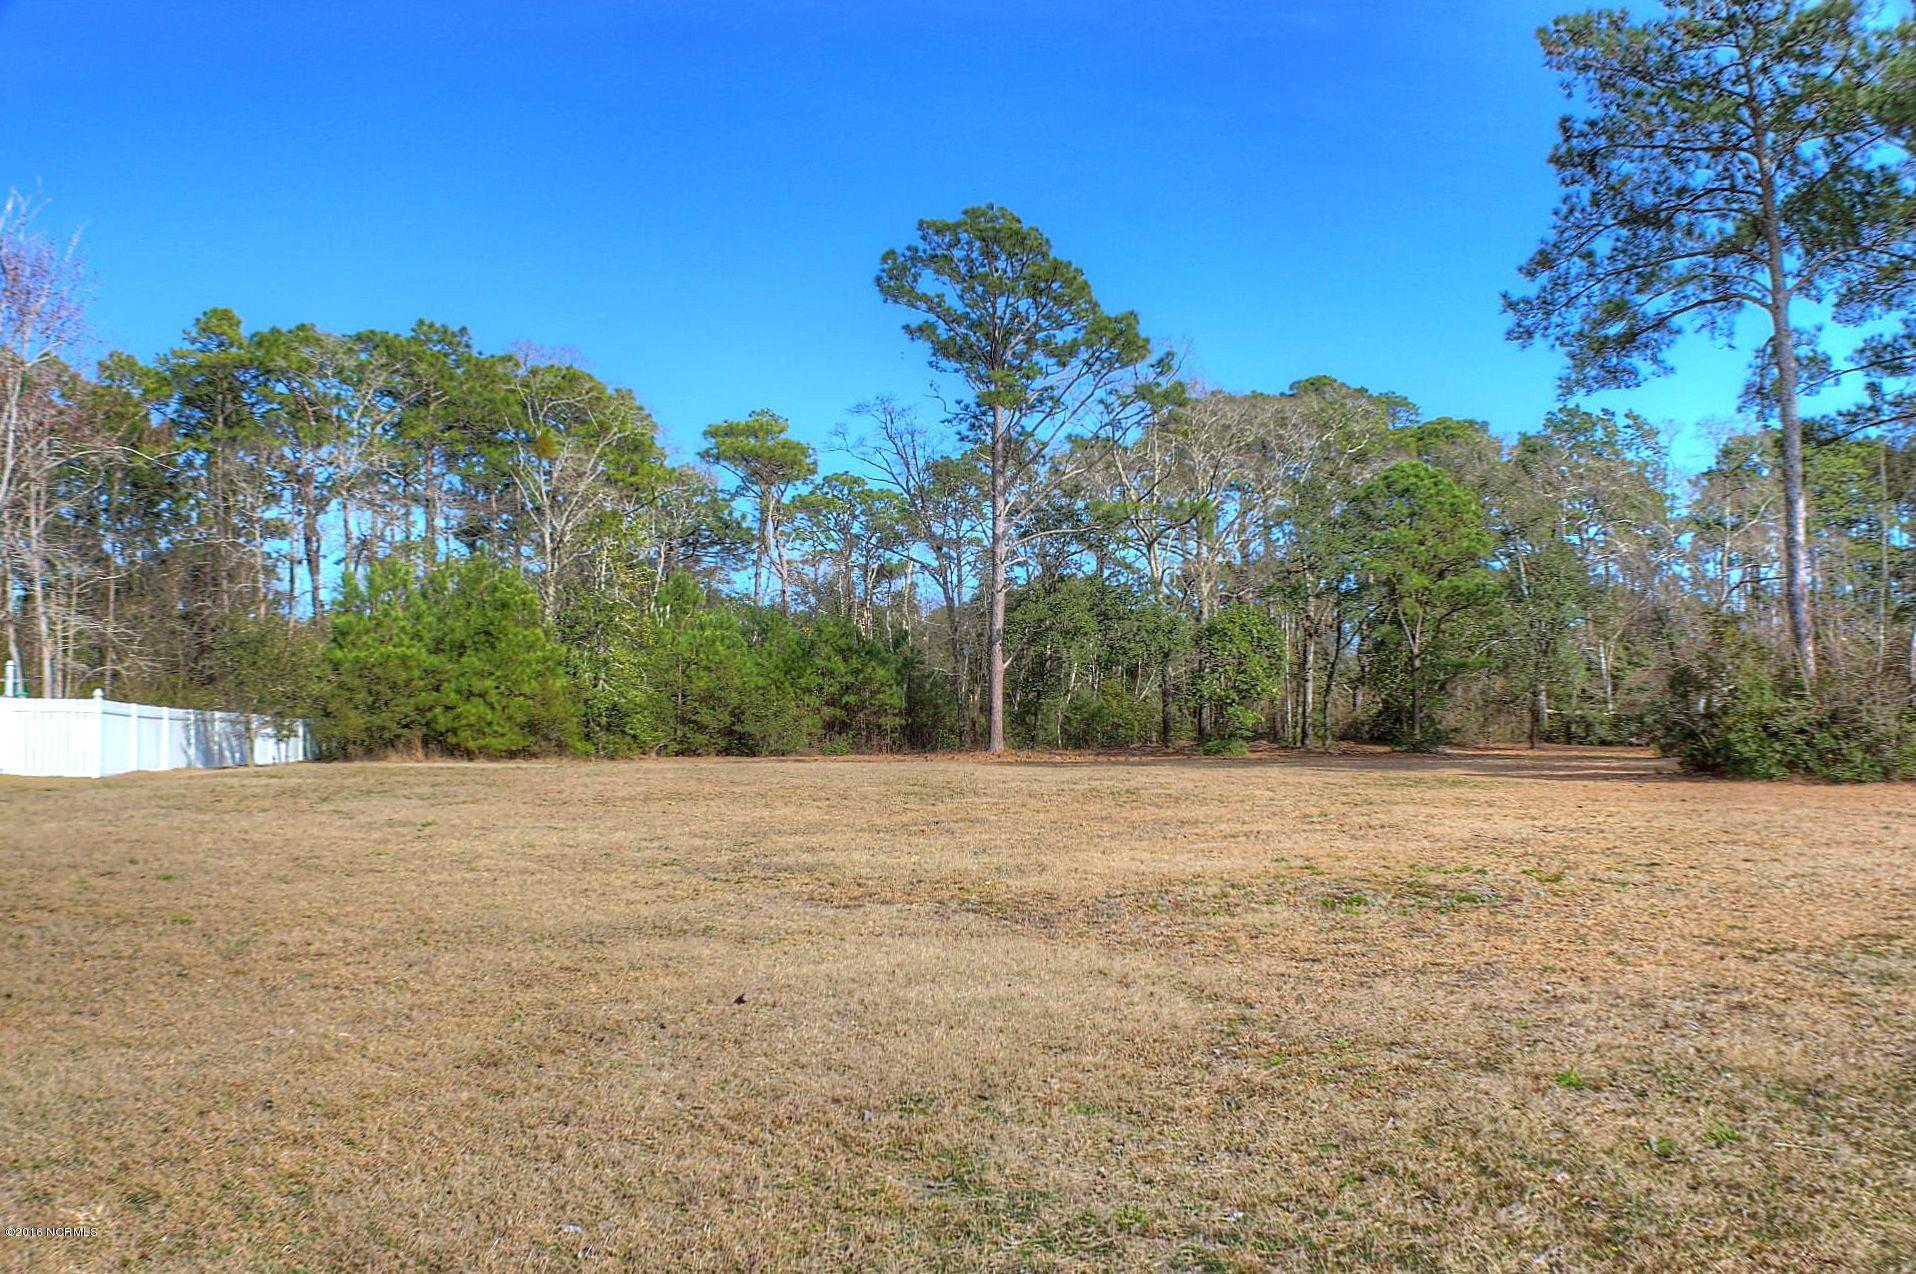 107 Buena Vista Drive, Newport, North Carolina 28570, ,Residential land,For sale,Buena Vista,100005297